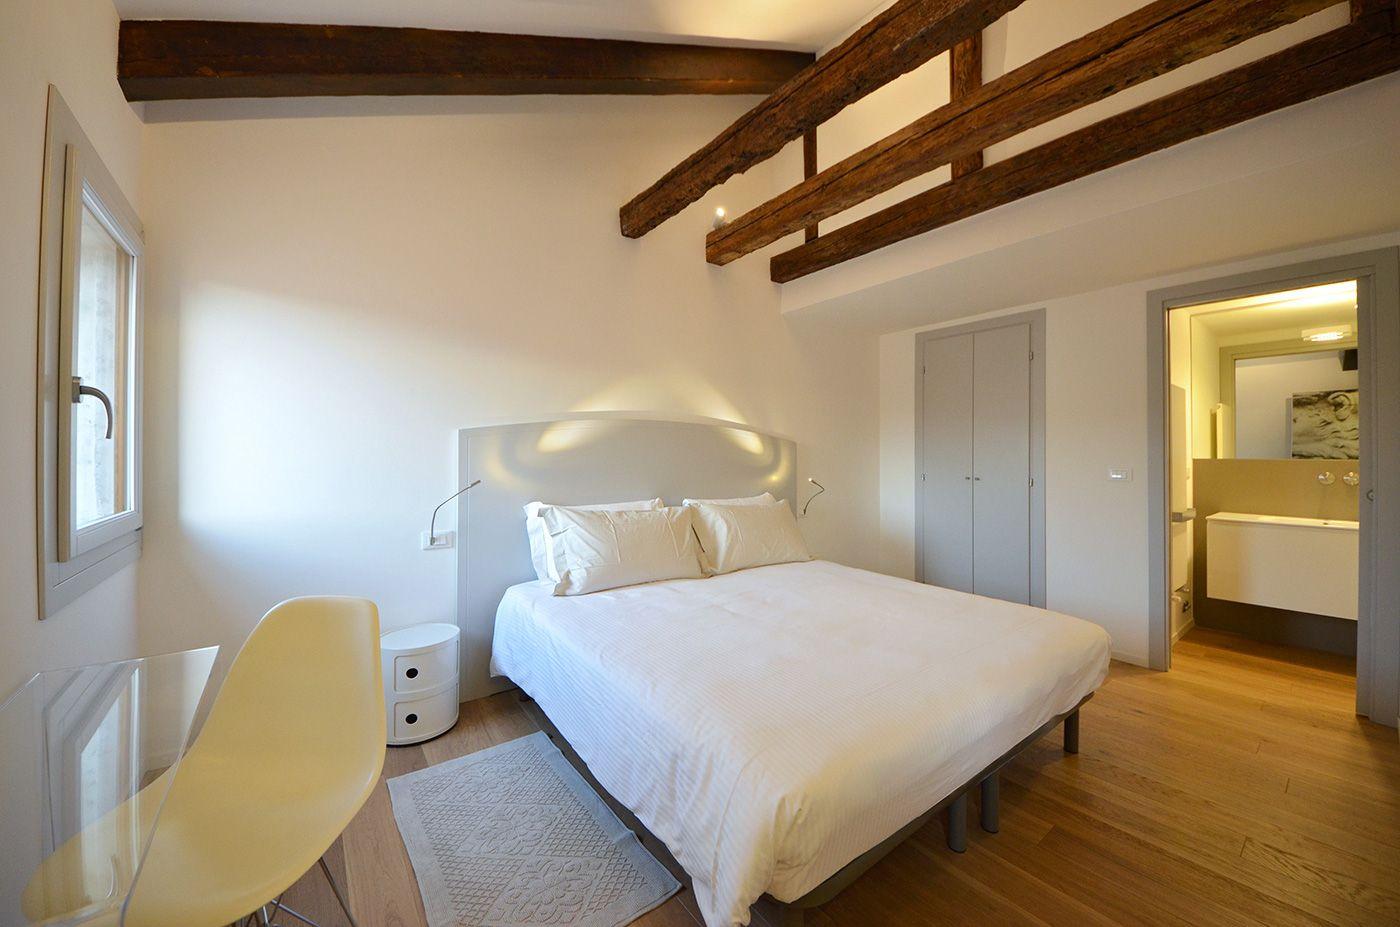 double bedroom with en-suite bathroom and walk-in wardrobe